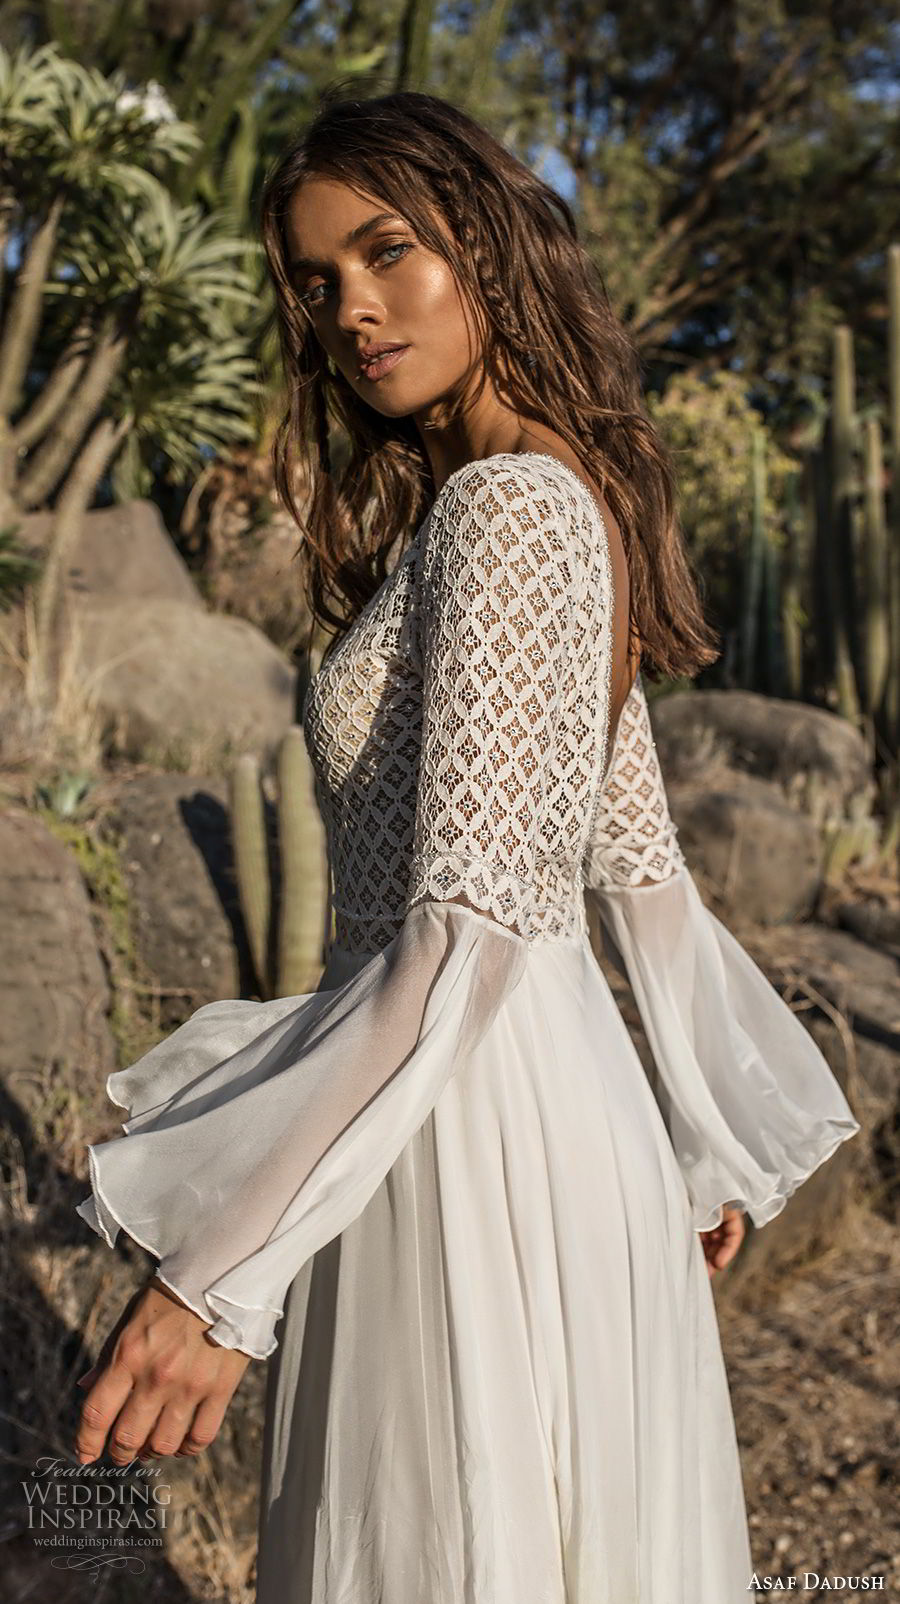 asaf dadush 2018 bridal long lantern sleeves deep v neckline heavily embellished bodice romantic bohemian soft a  line wedding dress open back sweep train (2) sdv